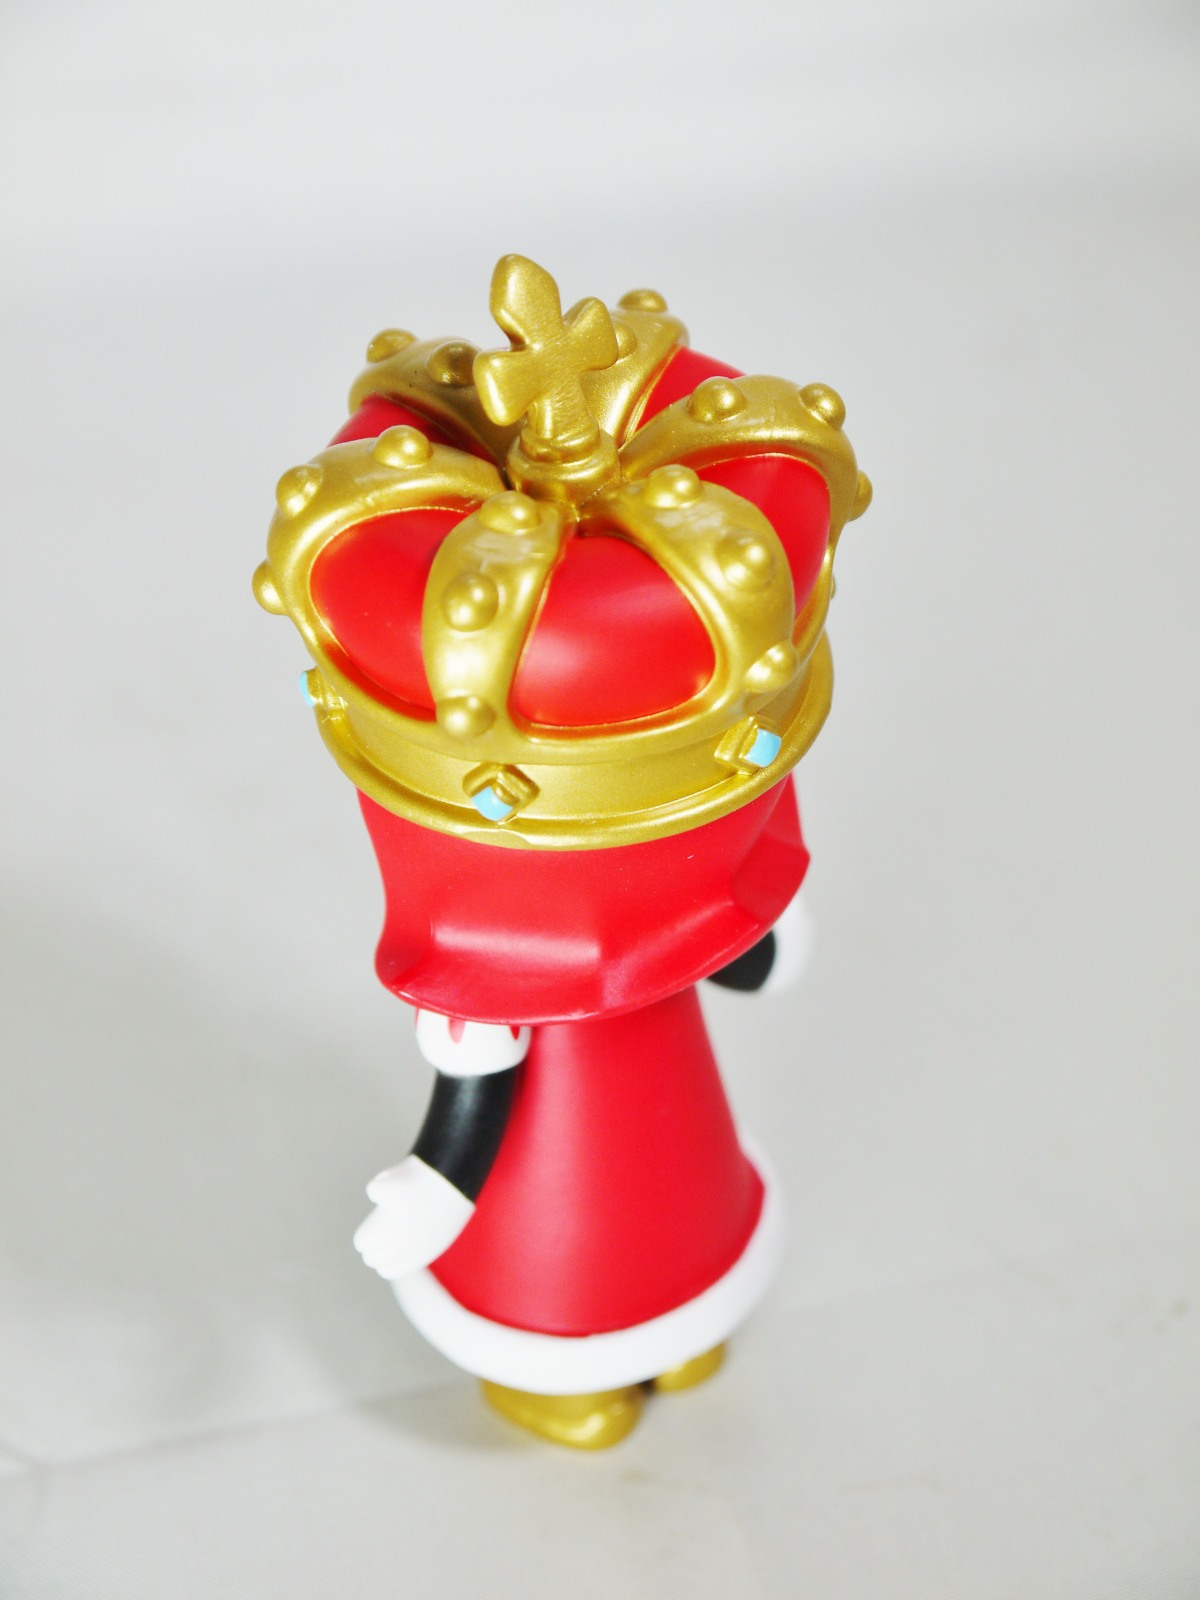 POP MART Kennyswork BLOCK Little Molly Chess Club Chessmate KING Red